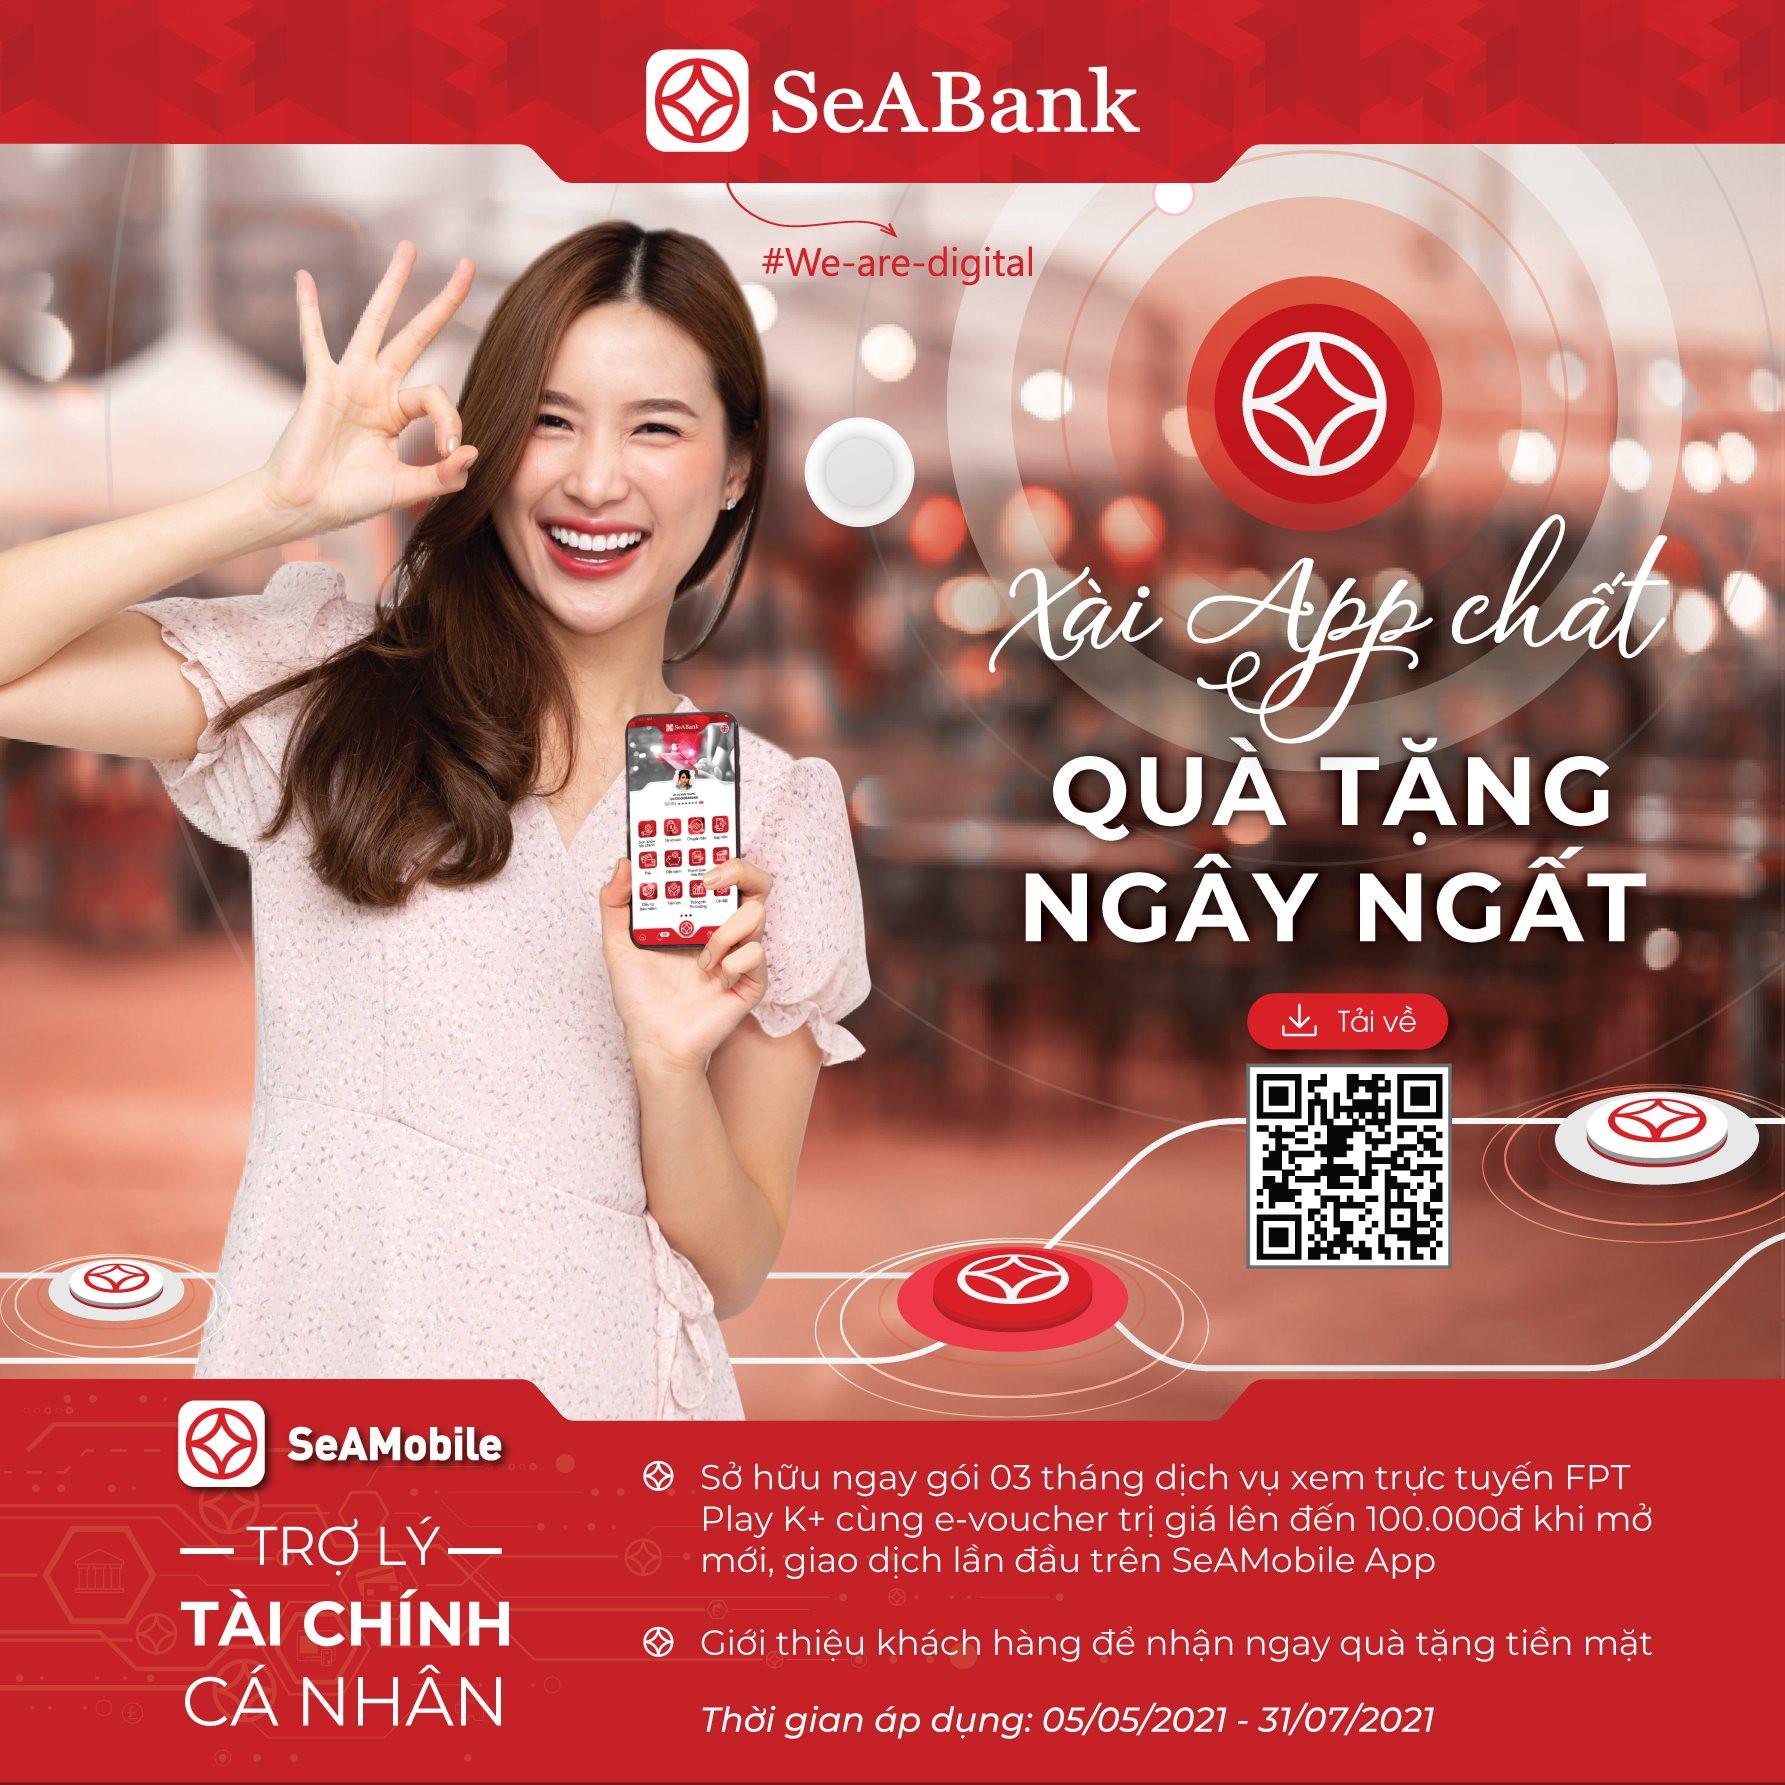 seabank-_-seamobile-qua-tang.jpg